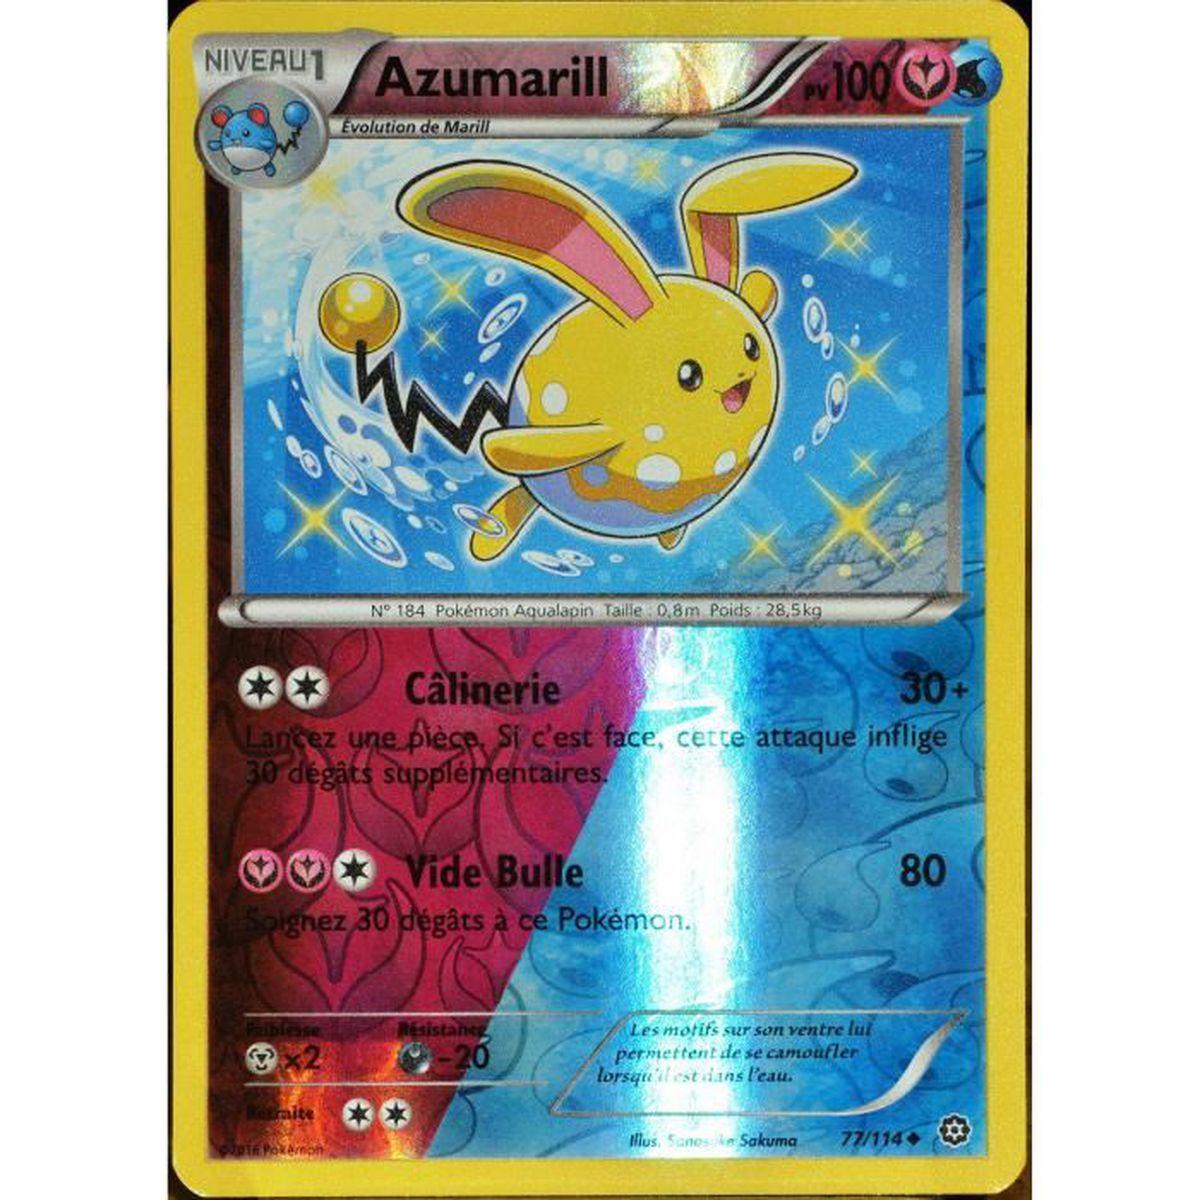 Carte pok mon 77 114 azumarill shiny 100 pv reverse xy offensive vapeur achat vente - Carte pokemon fee ...